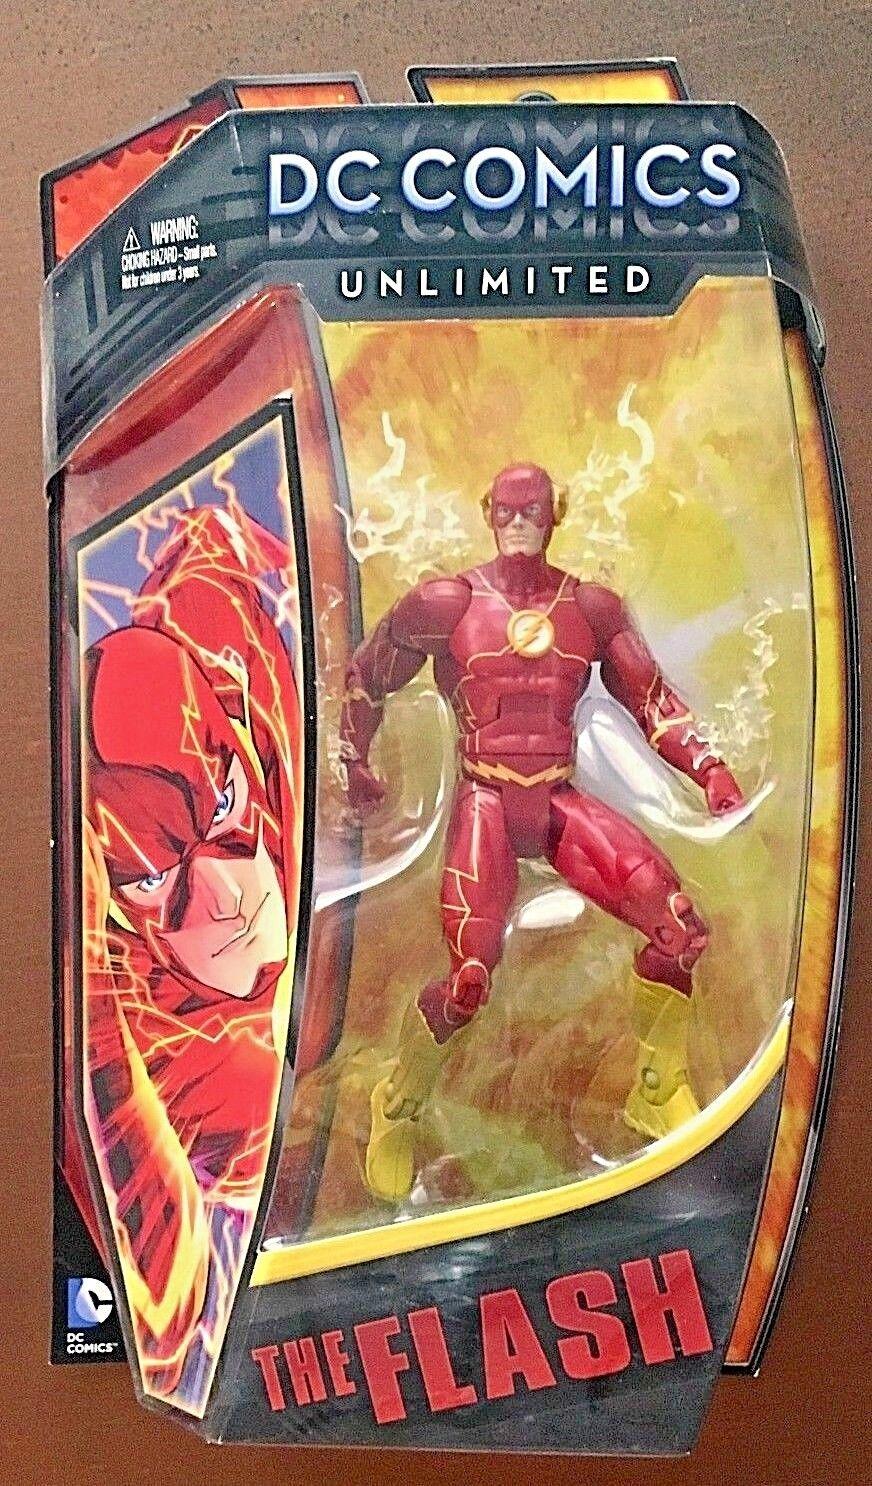 BRAND NEW DC Comics Unlimited The Flash Mattel